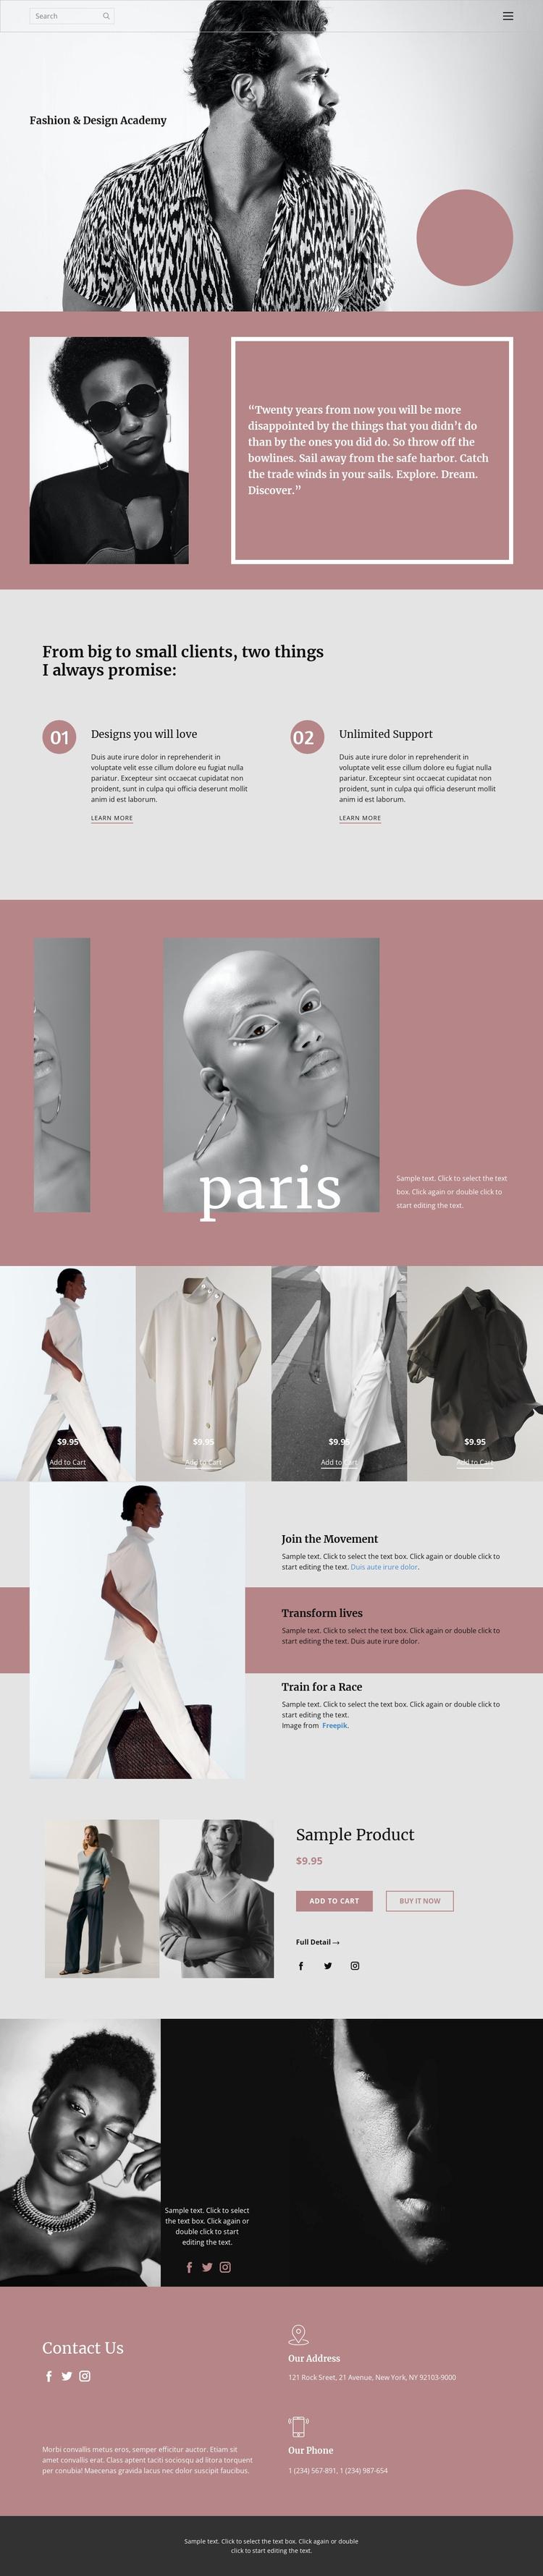 Fashion studio Landing Page